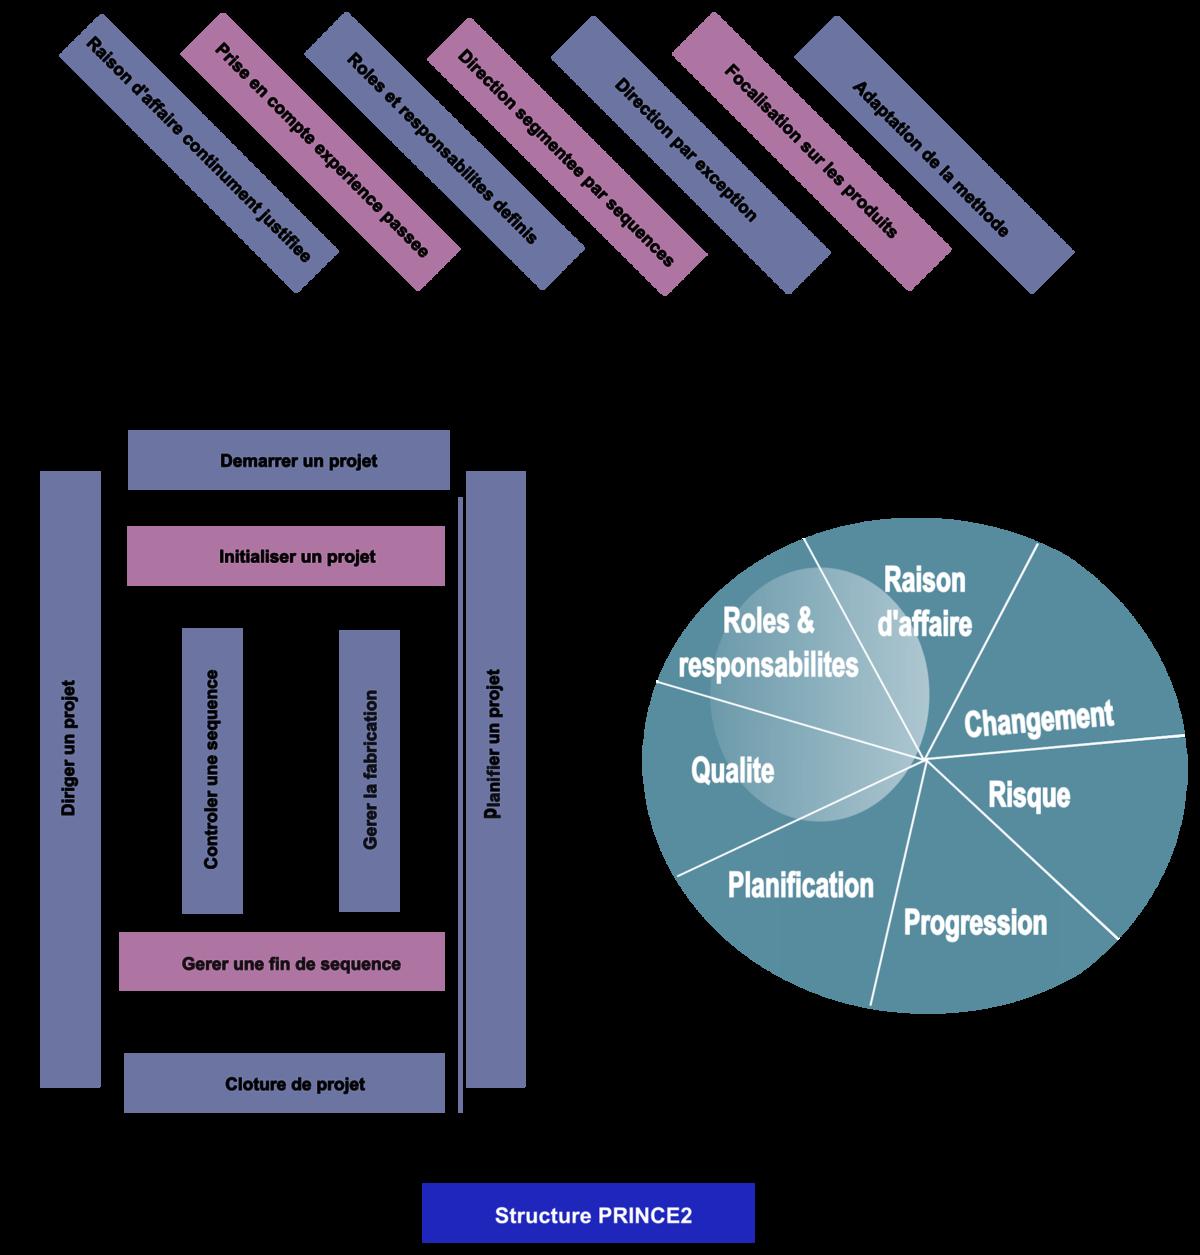 prince2 project management methodology pdf